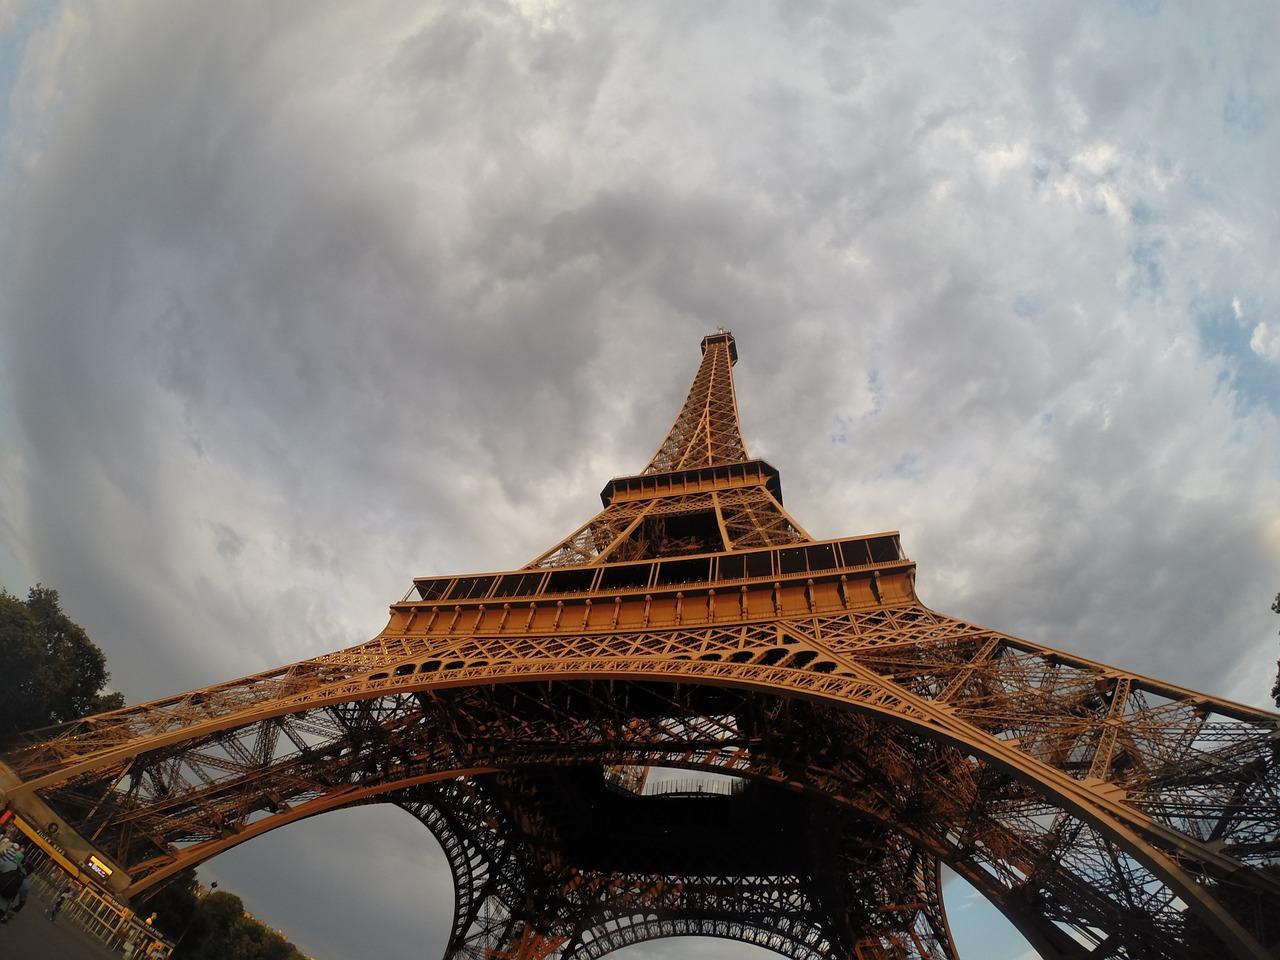 tower-964640_1280.jpg